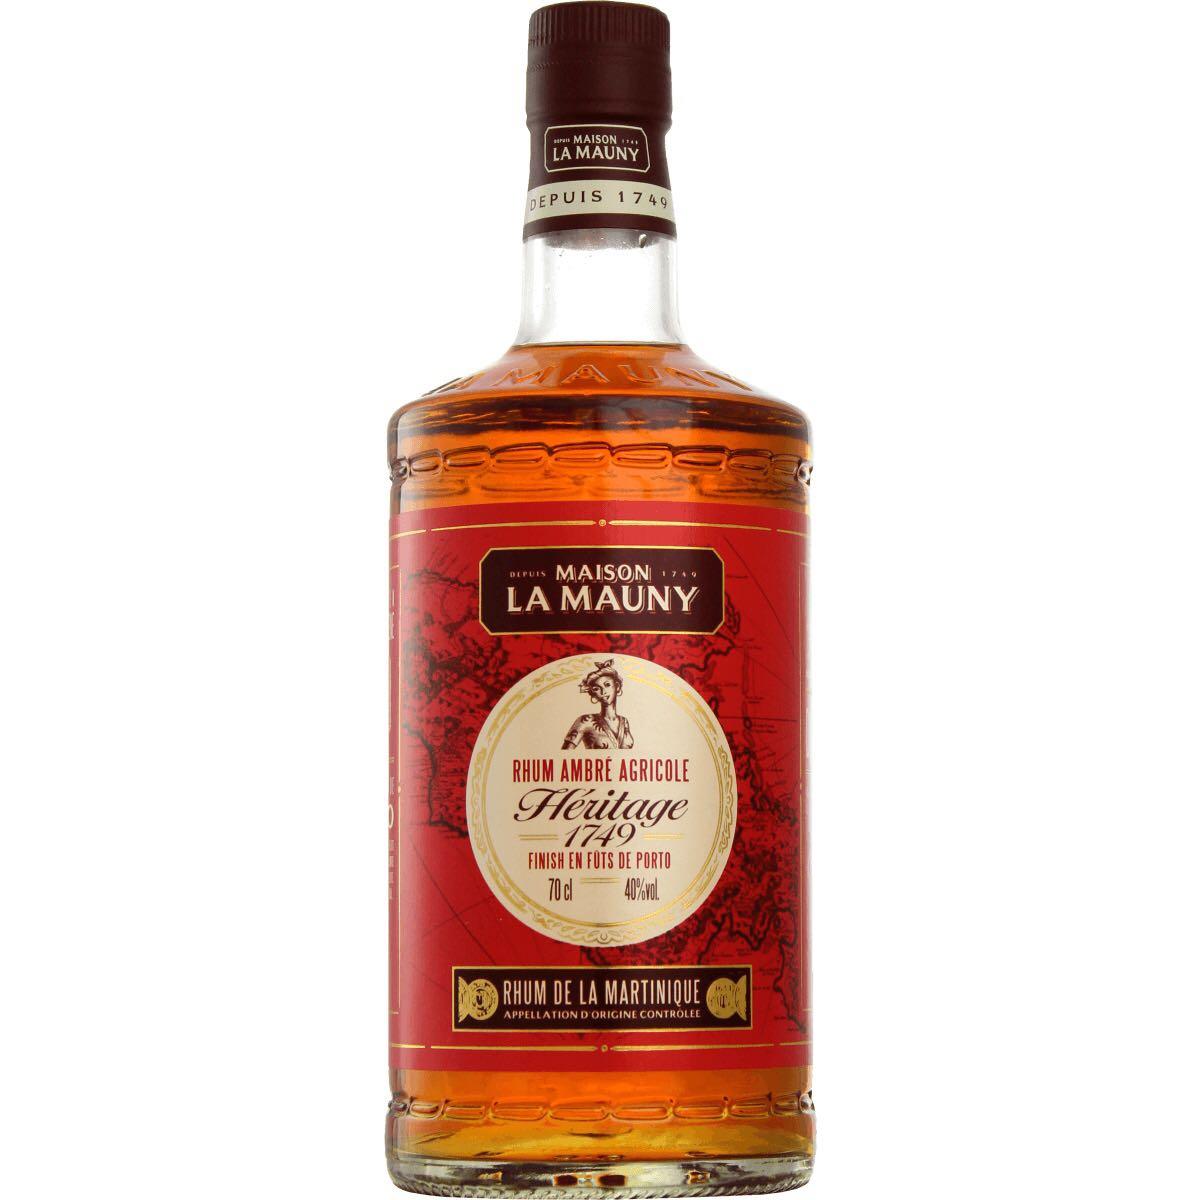 Bottle image of Heritage 1749